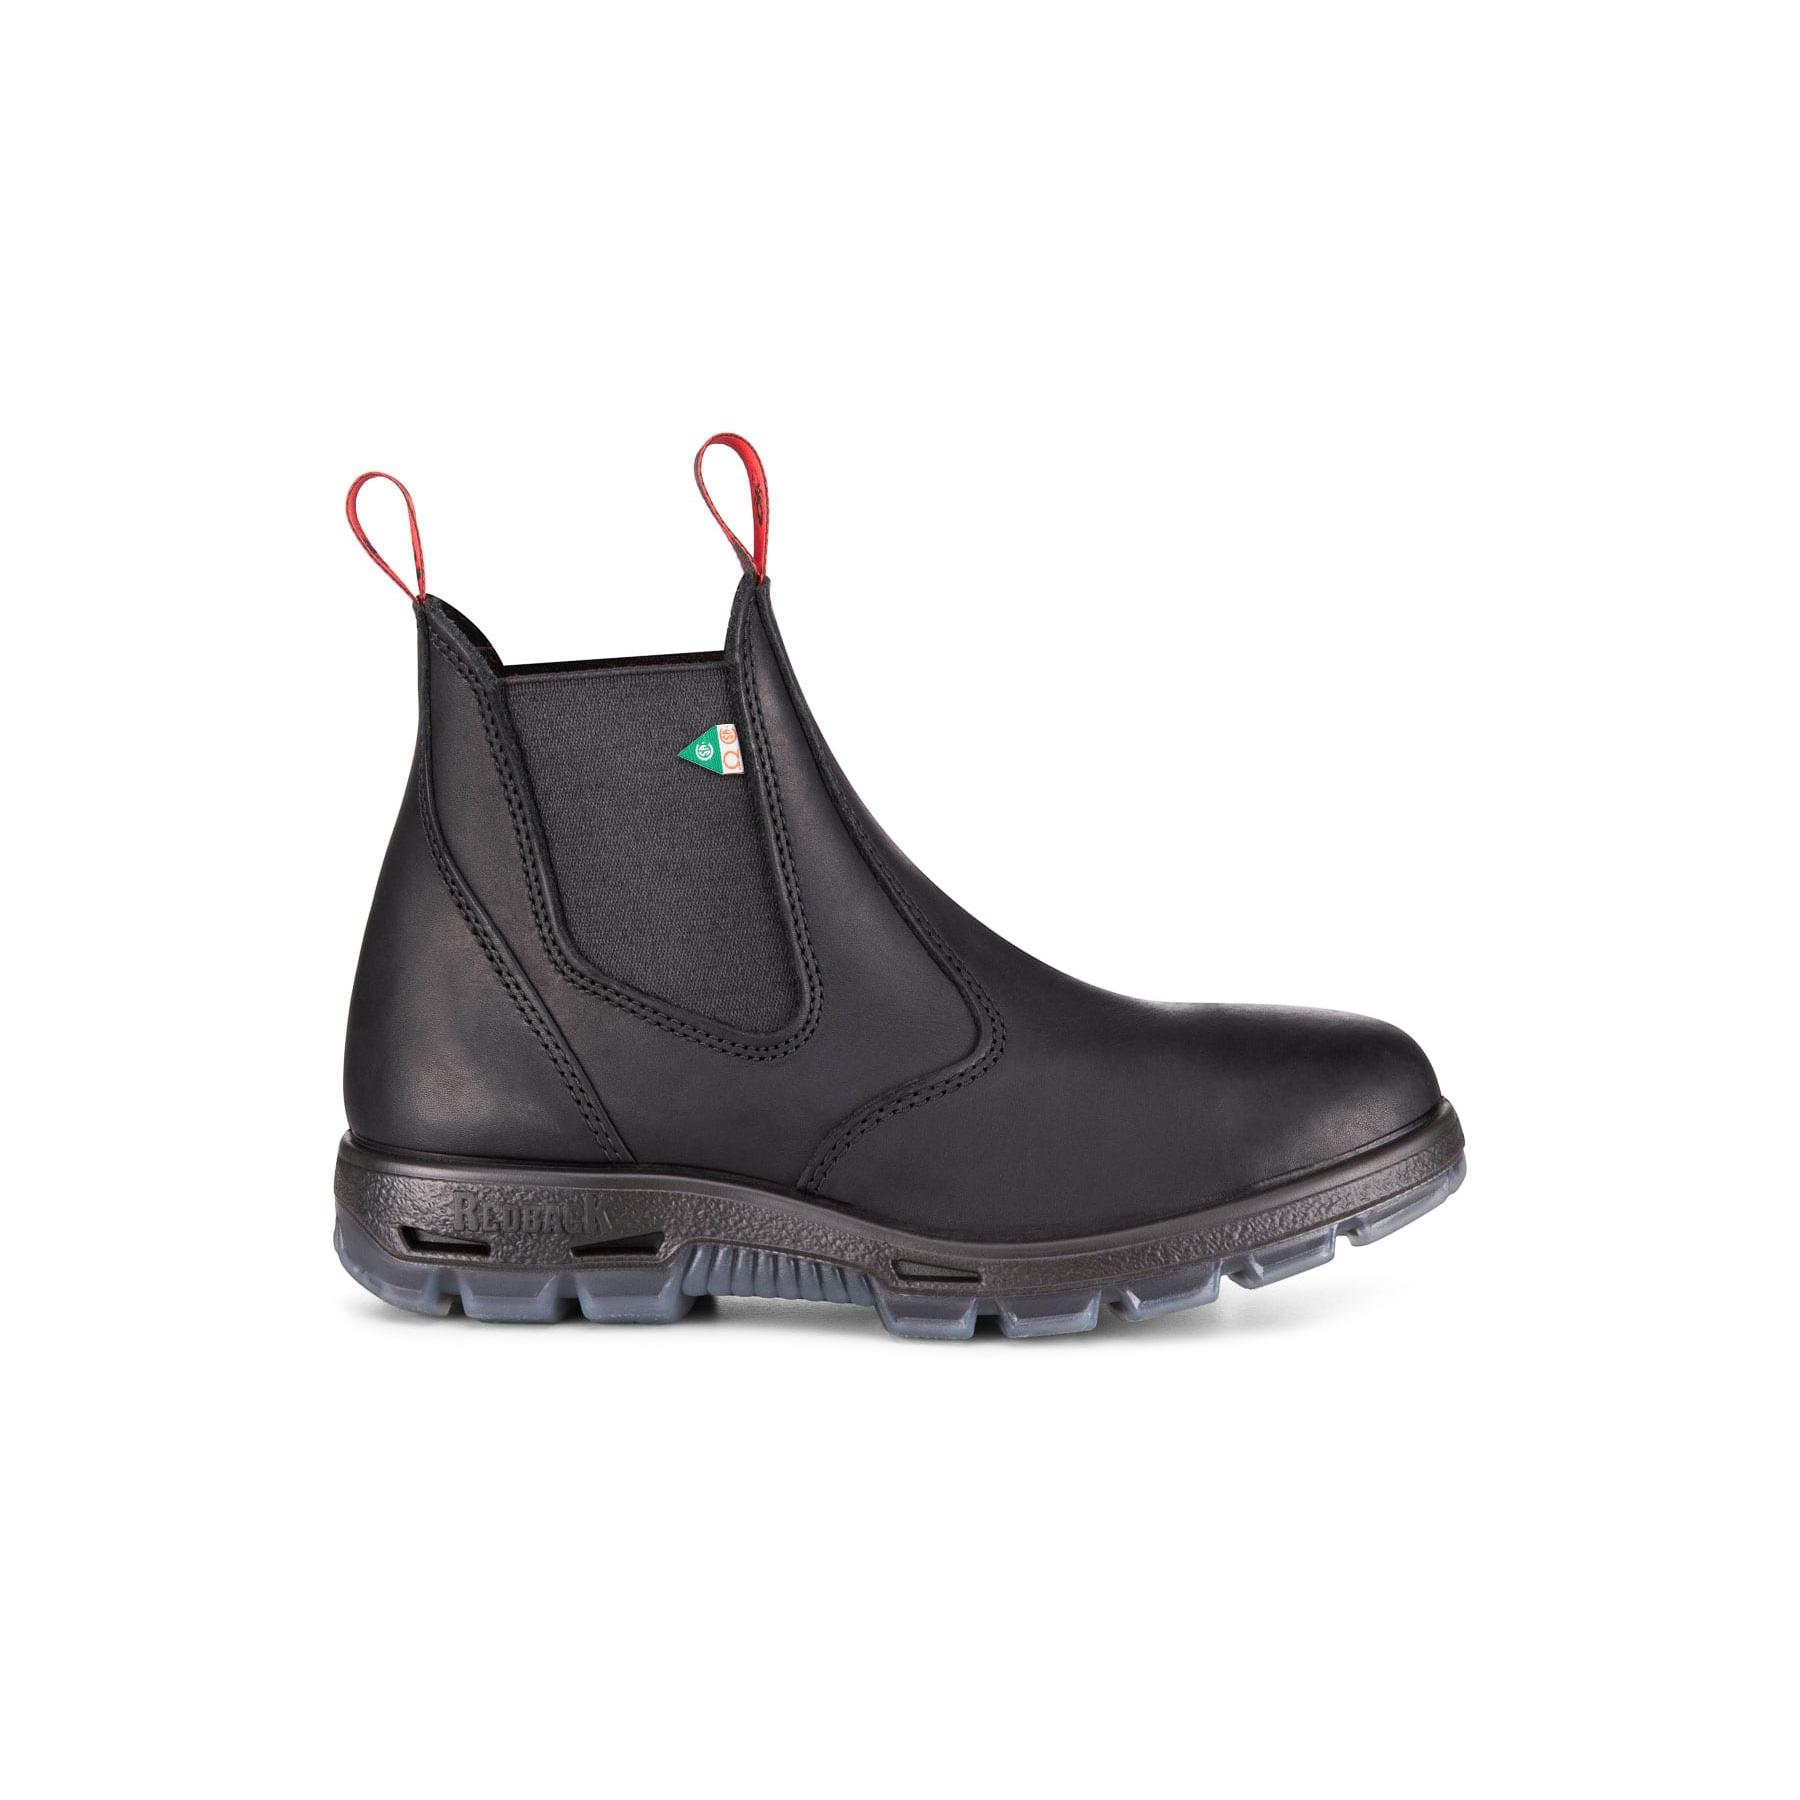 Bobcat CSA Steel Toe Boot Black - Men's